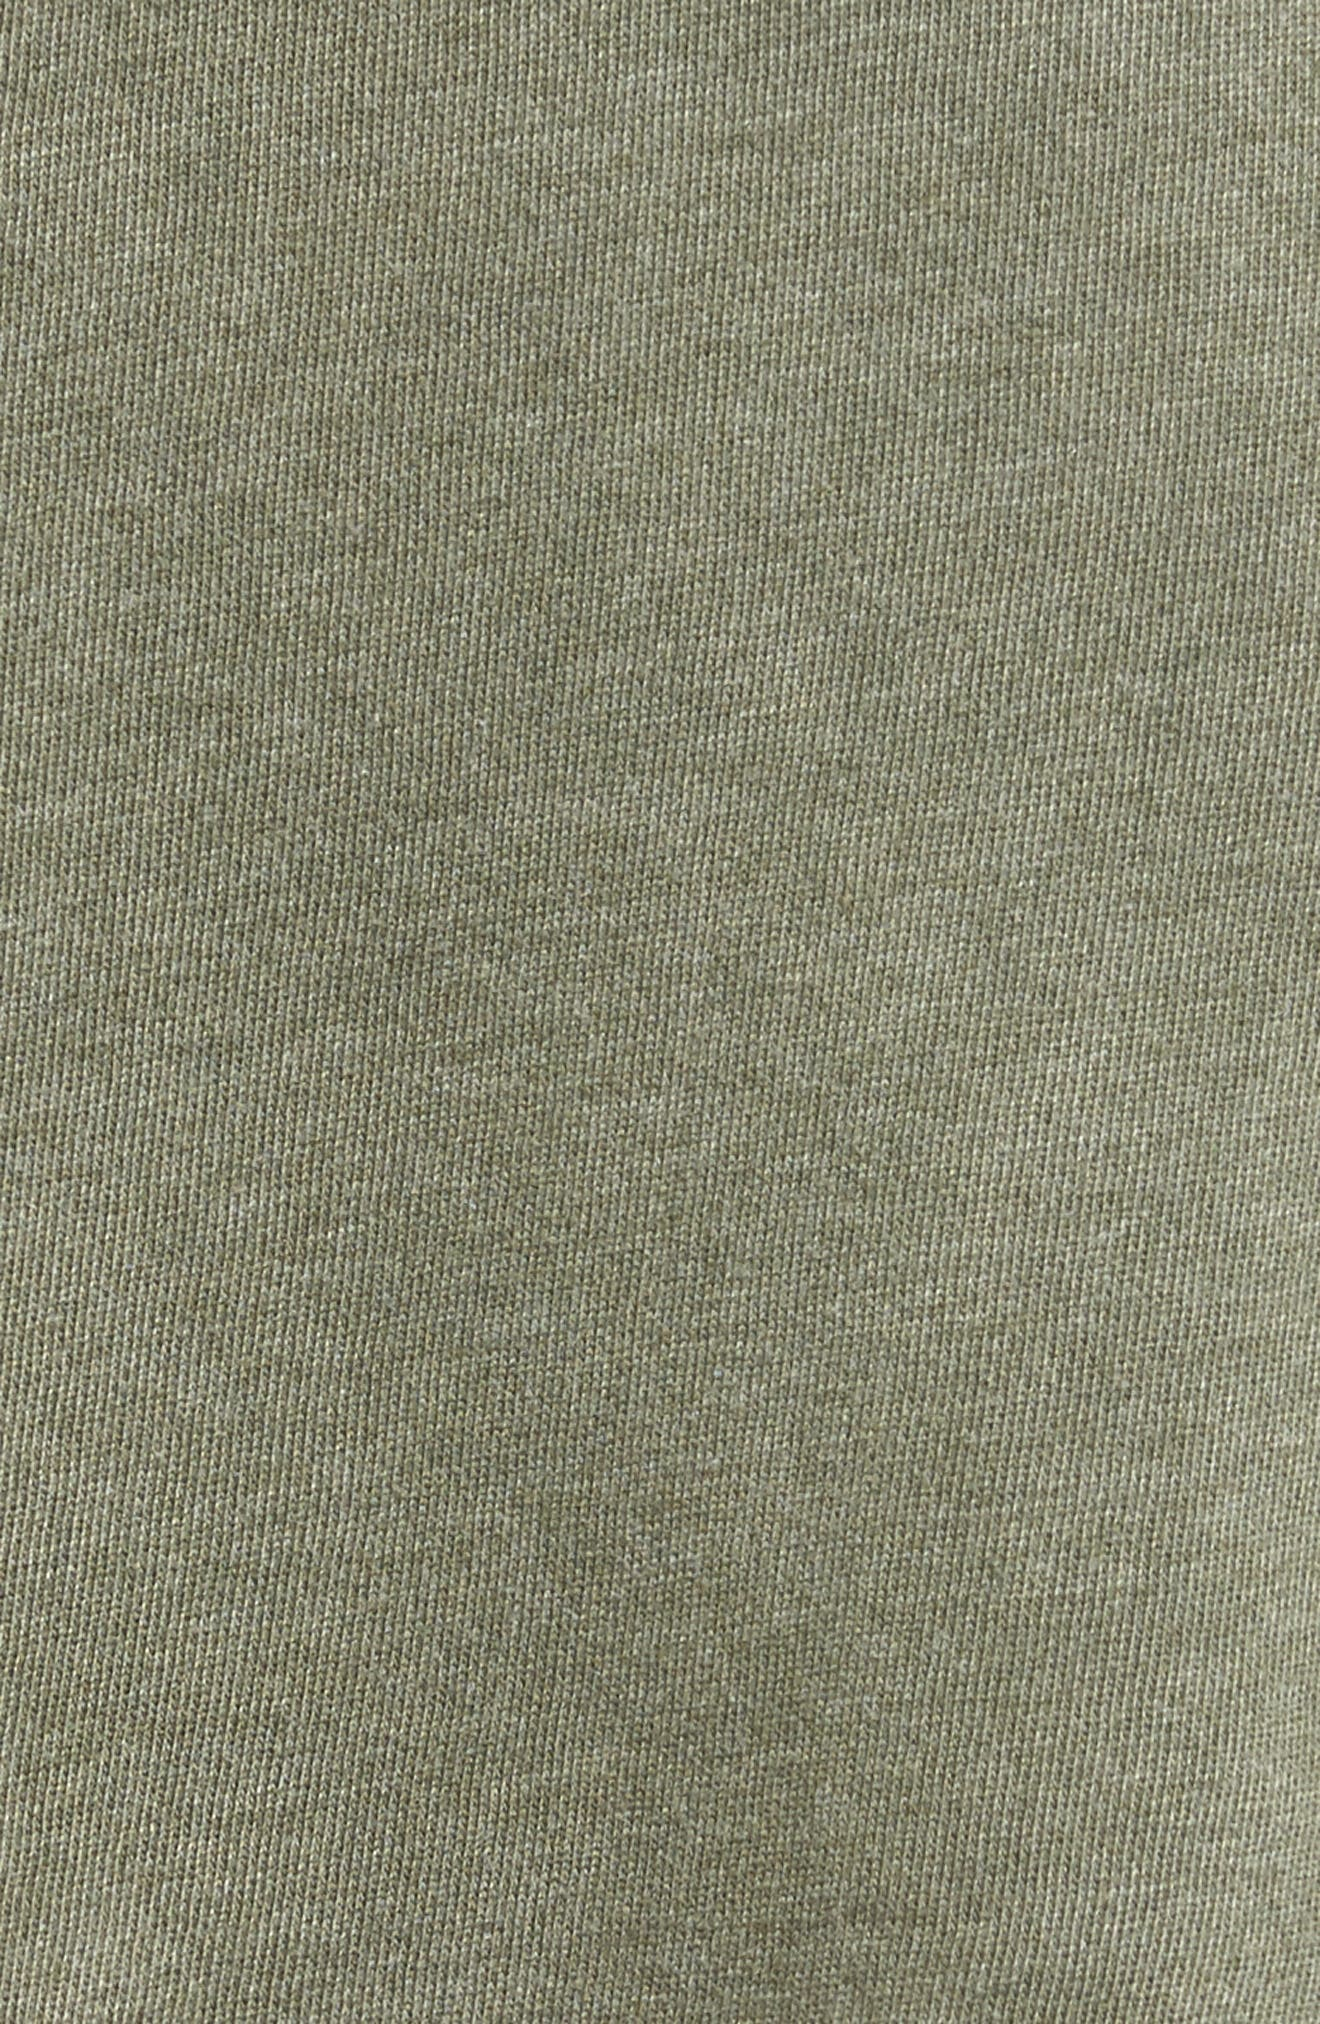 Ripped Sweatshirt Dress,                             Alternate thumbnail 5, color,                             Olive Dark